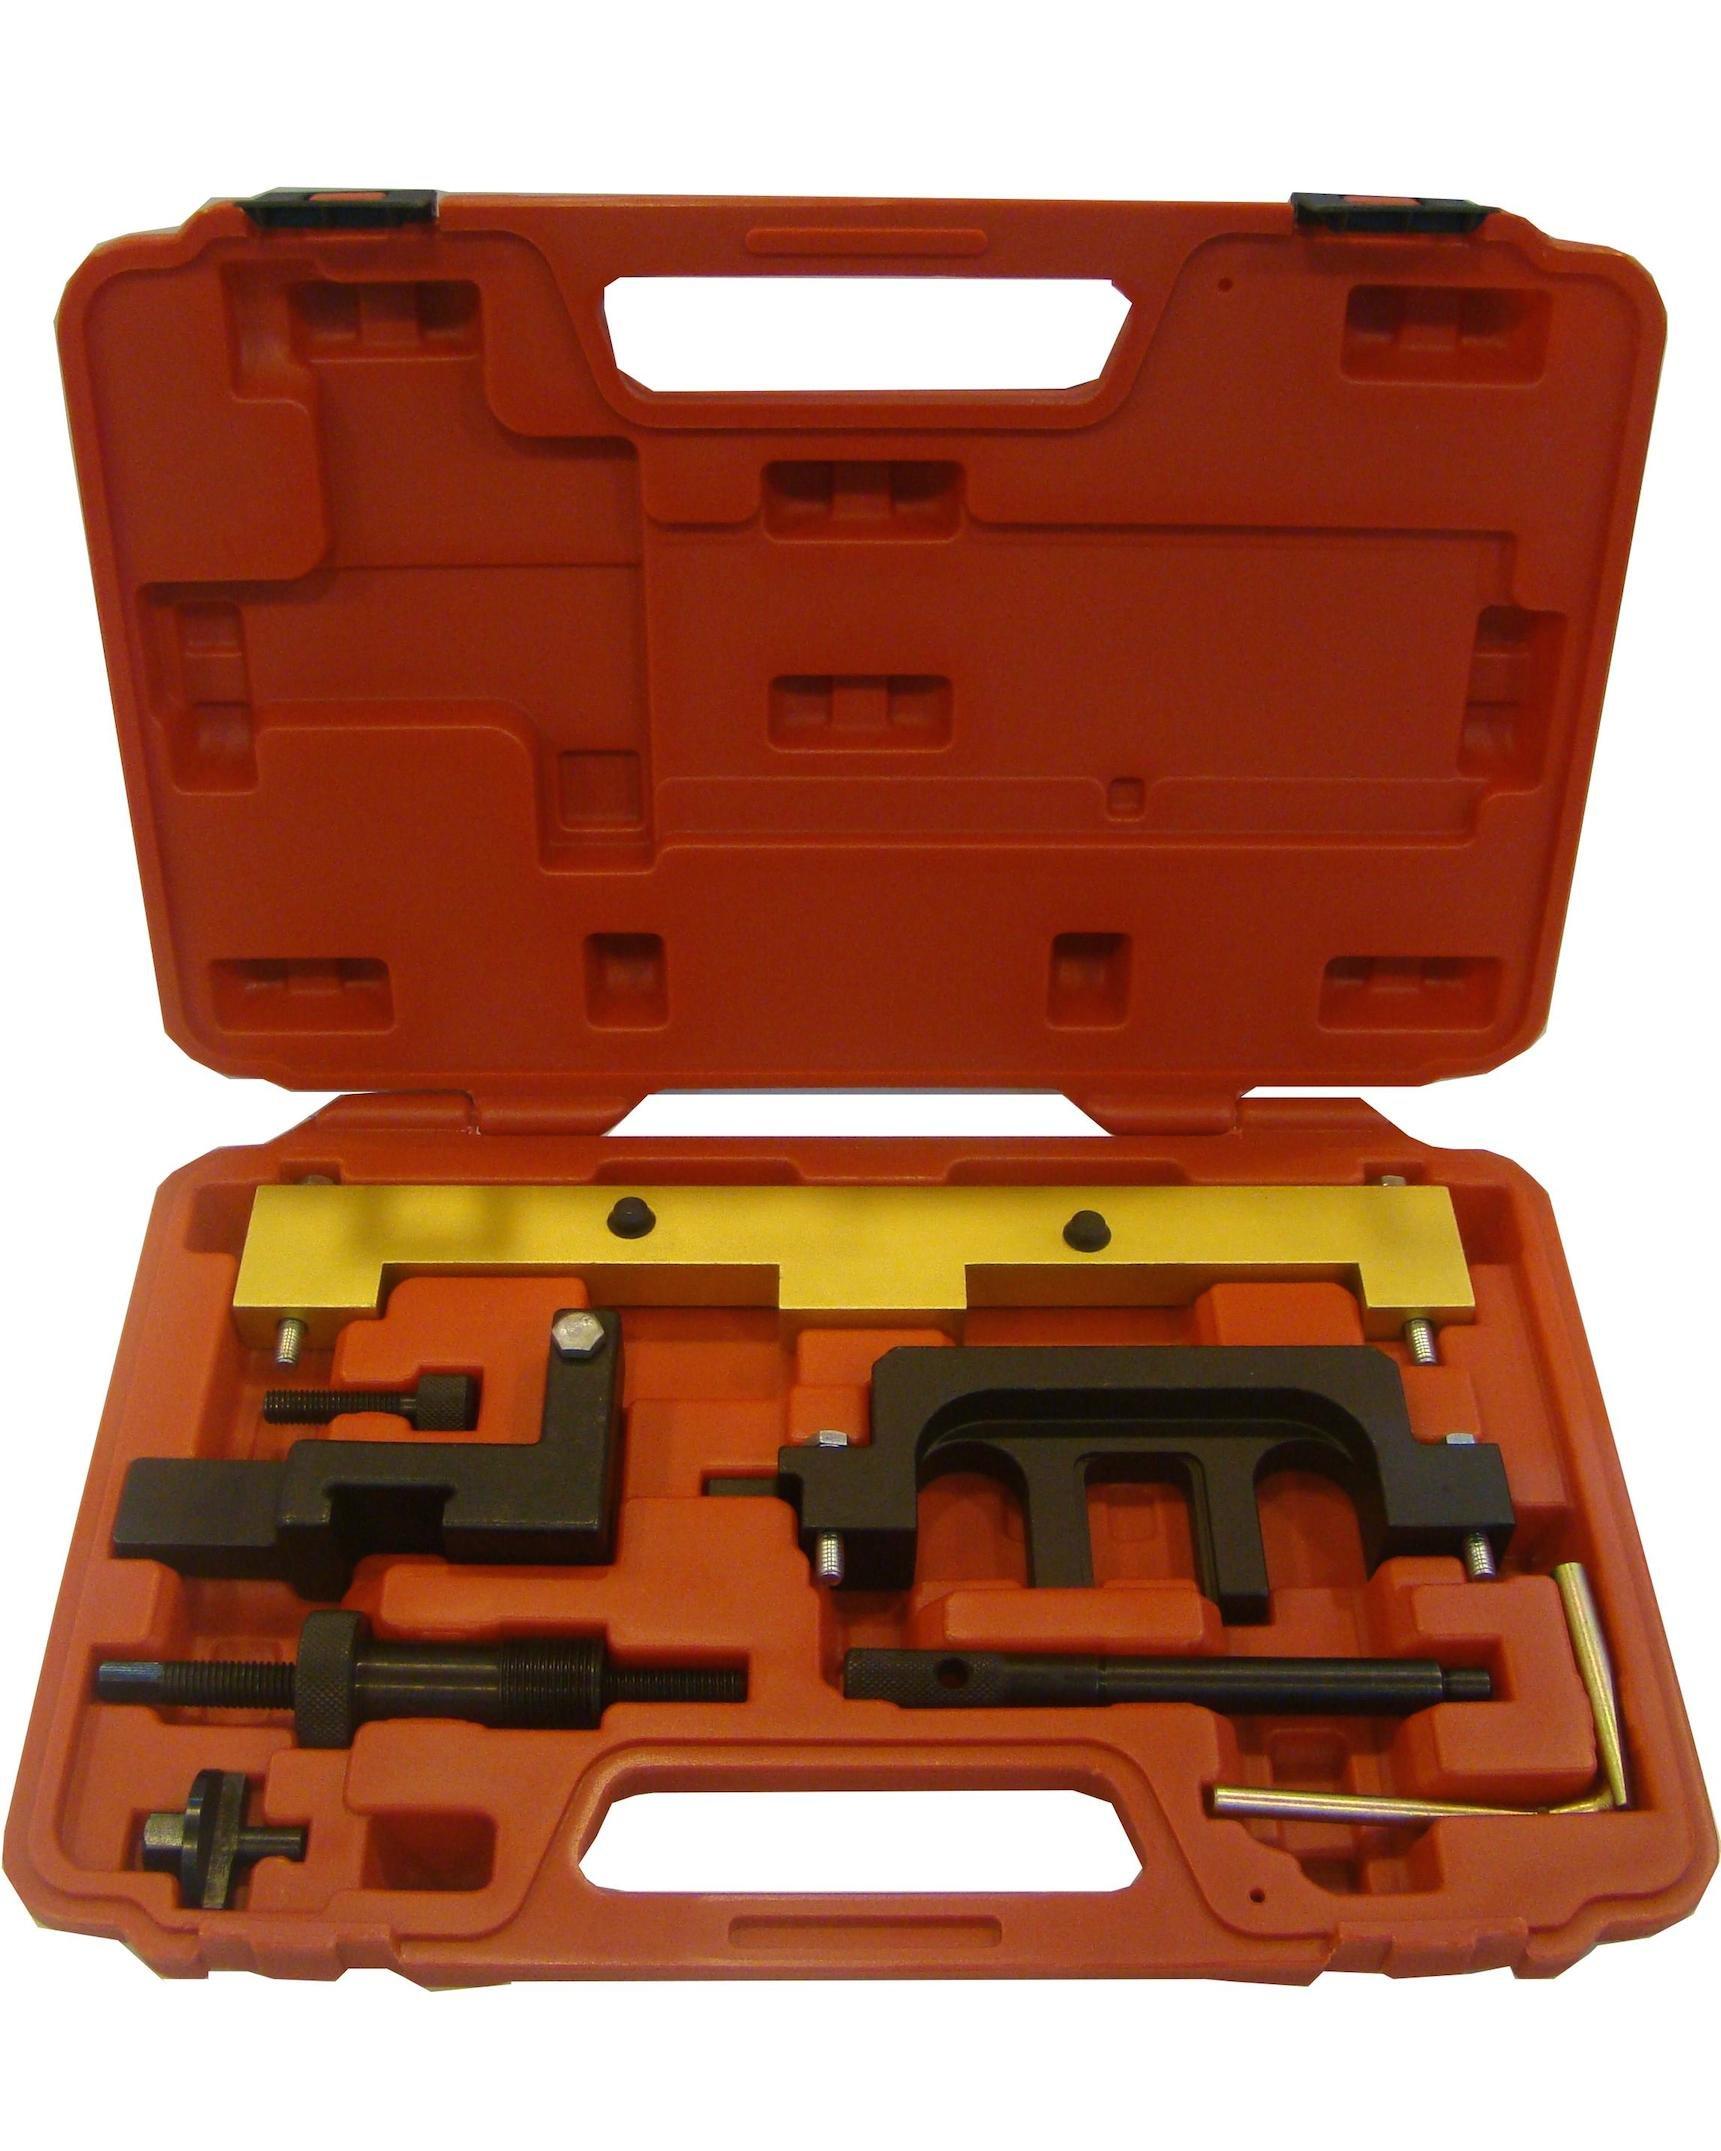 CTA Tools 2891 BMW Timing Tool Kit for N42, N46, N46T